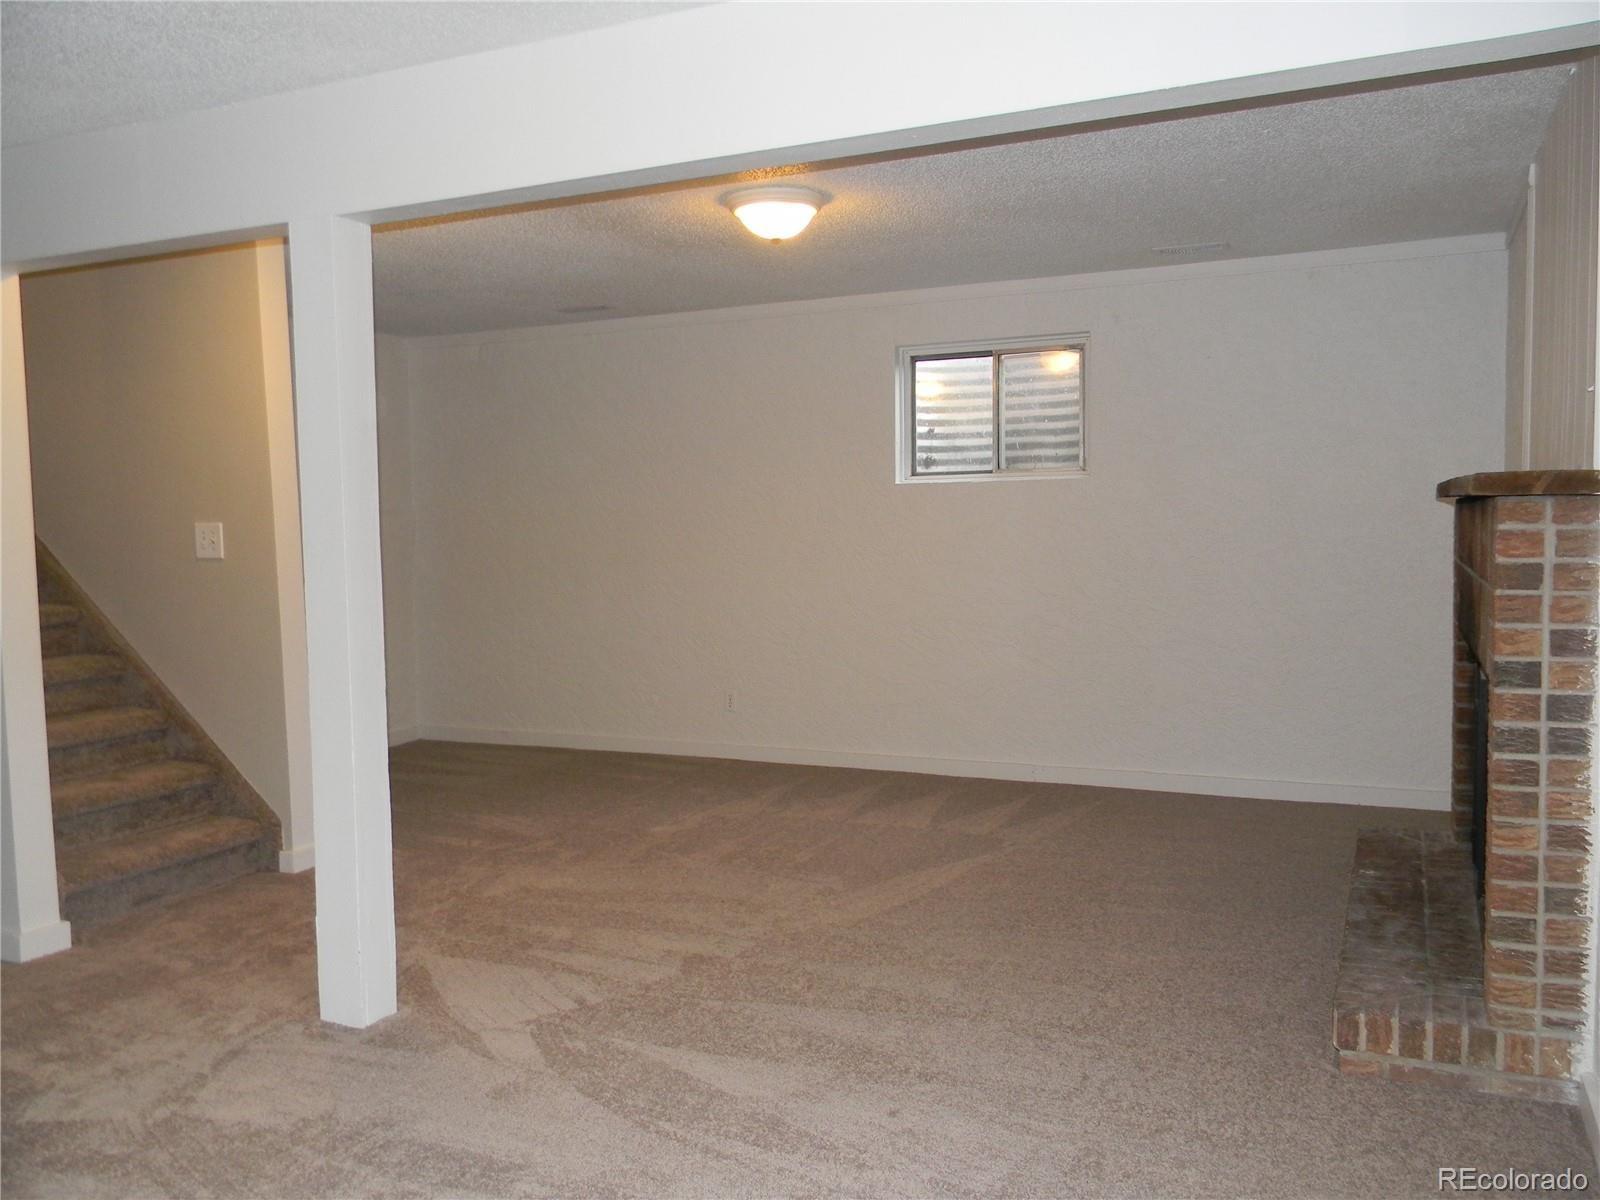 MLS# 5946356 - 19 - 4920 Ridenour Drive, Colorado Springs, CO 80916